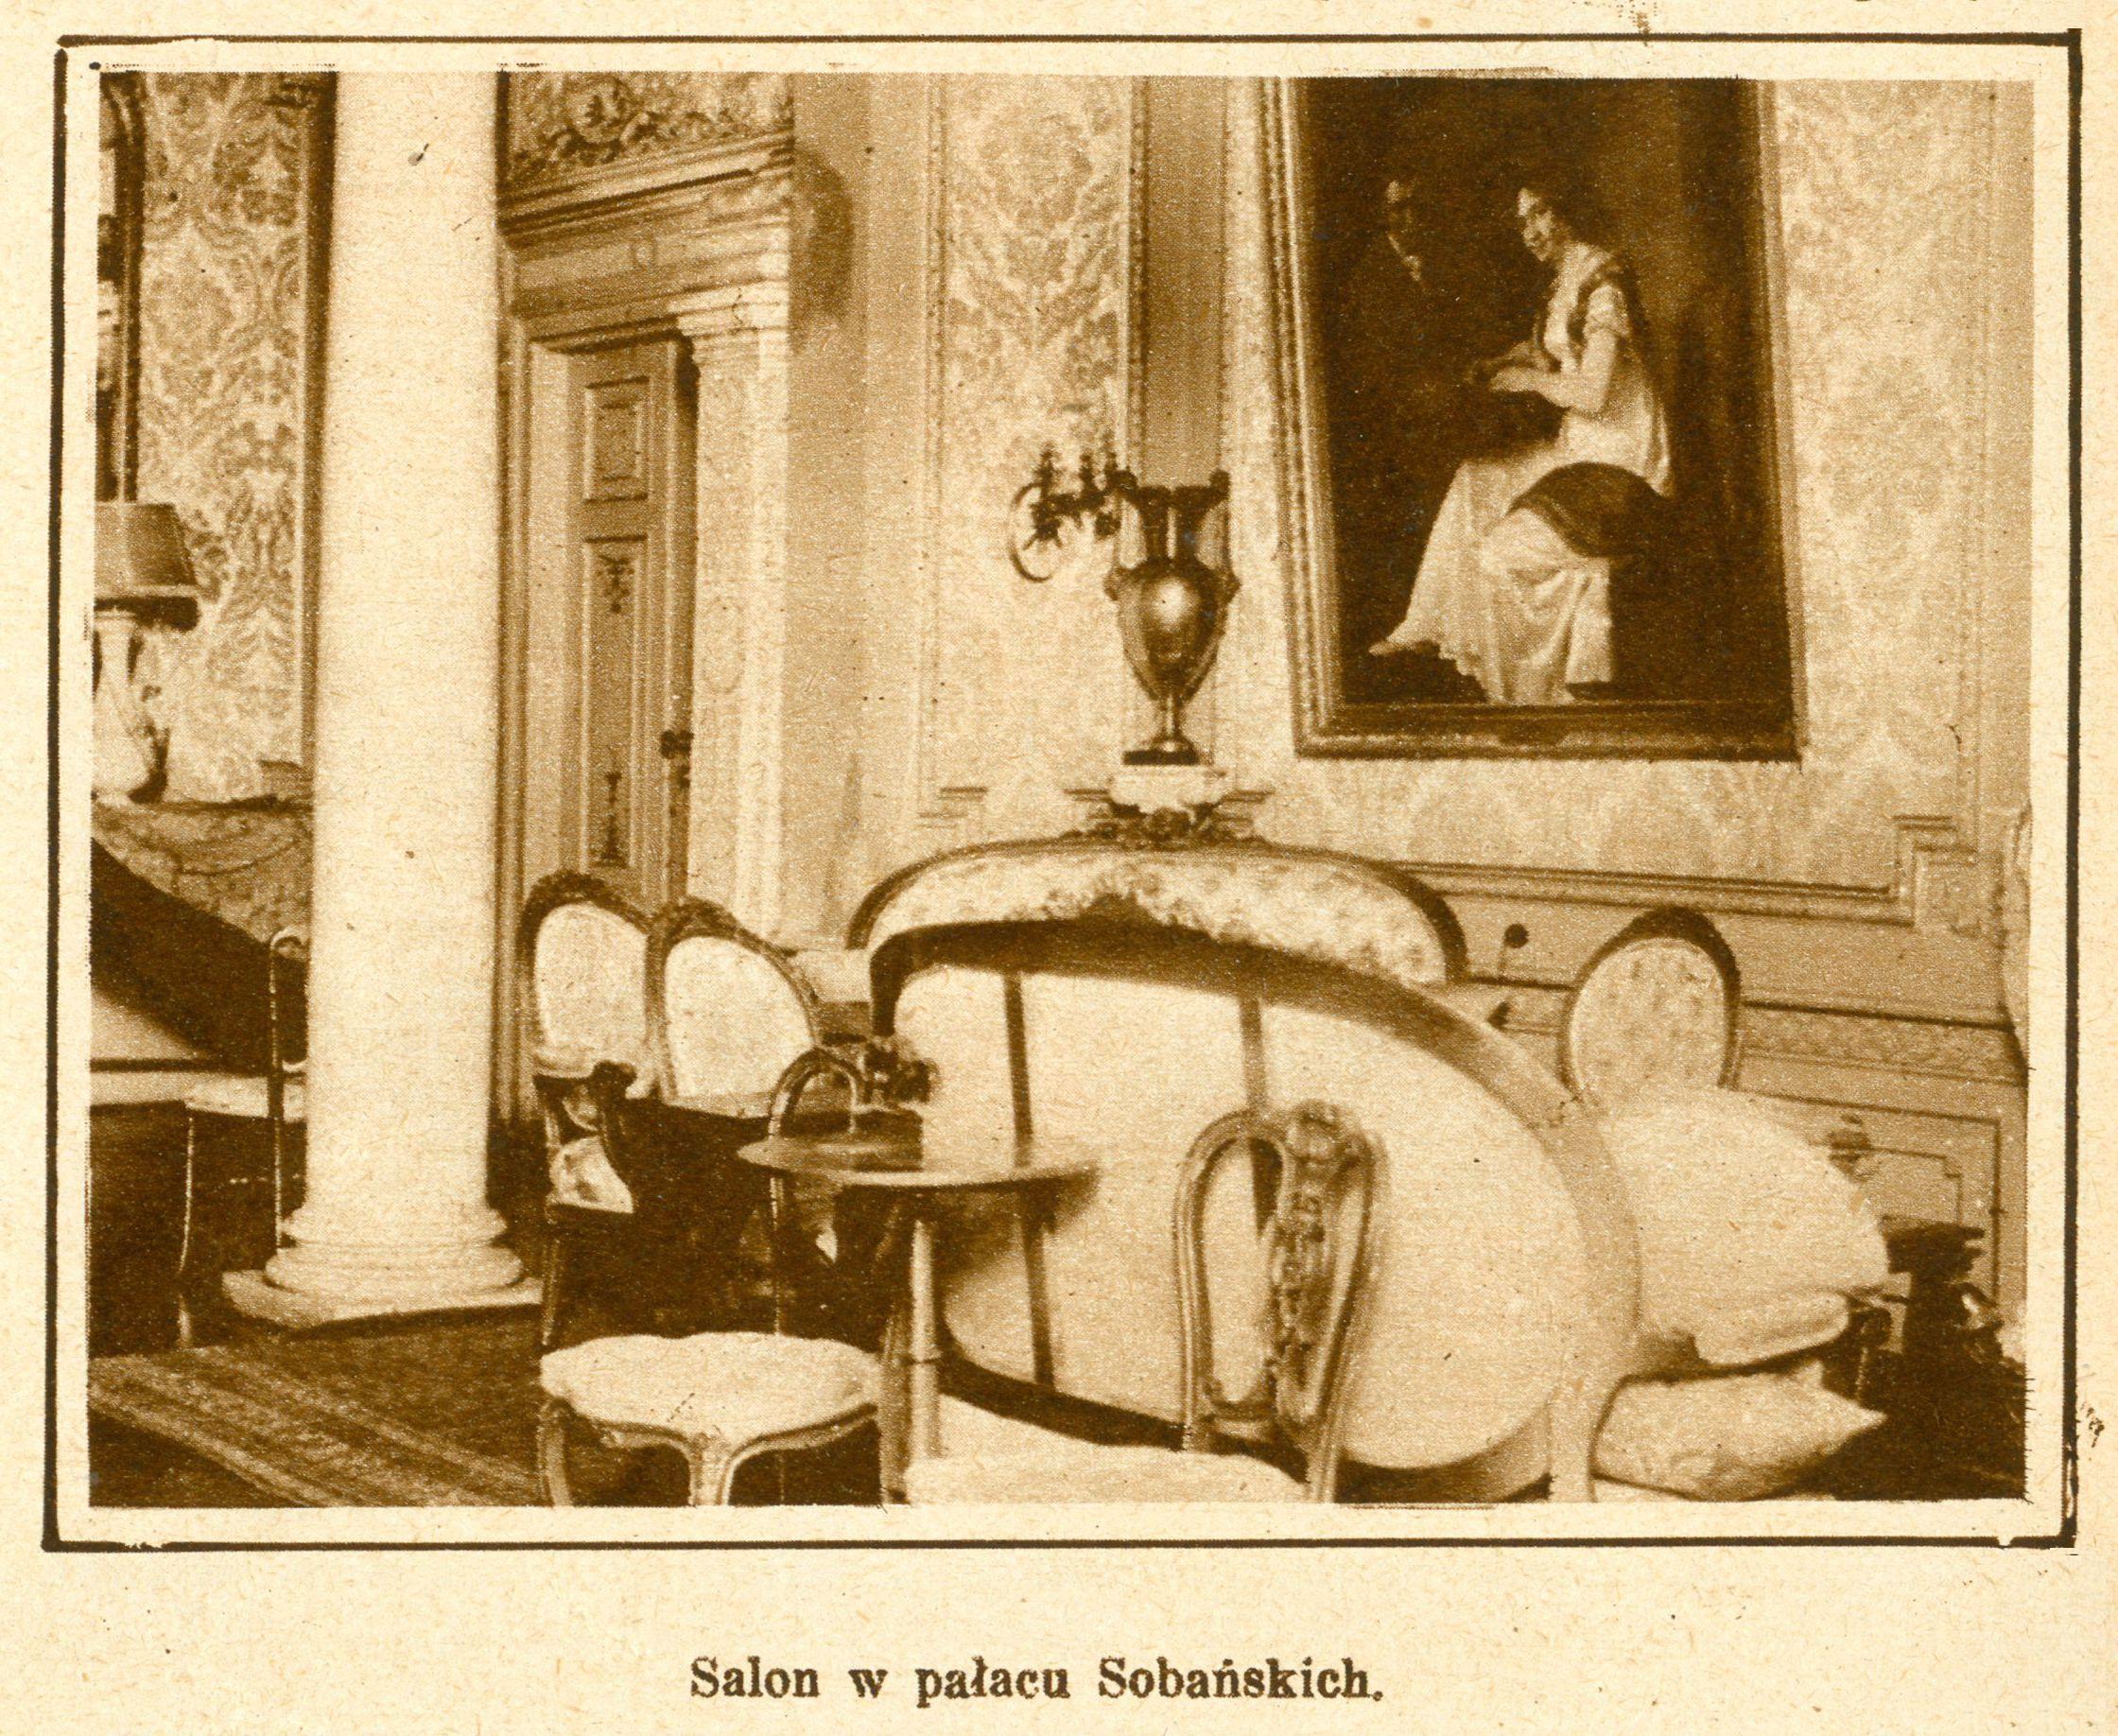 Swaitowid nr 51 17.12.1927 palac Sobanskich Warszawa 3